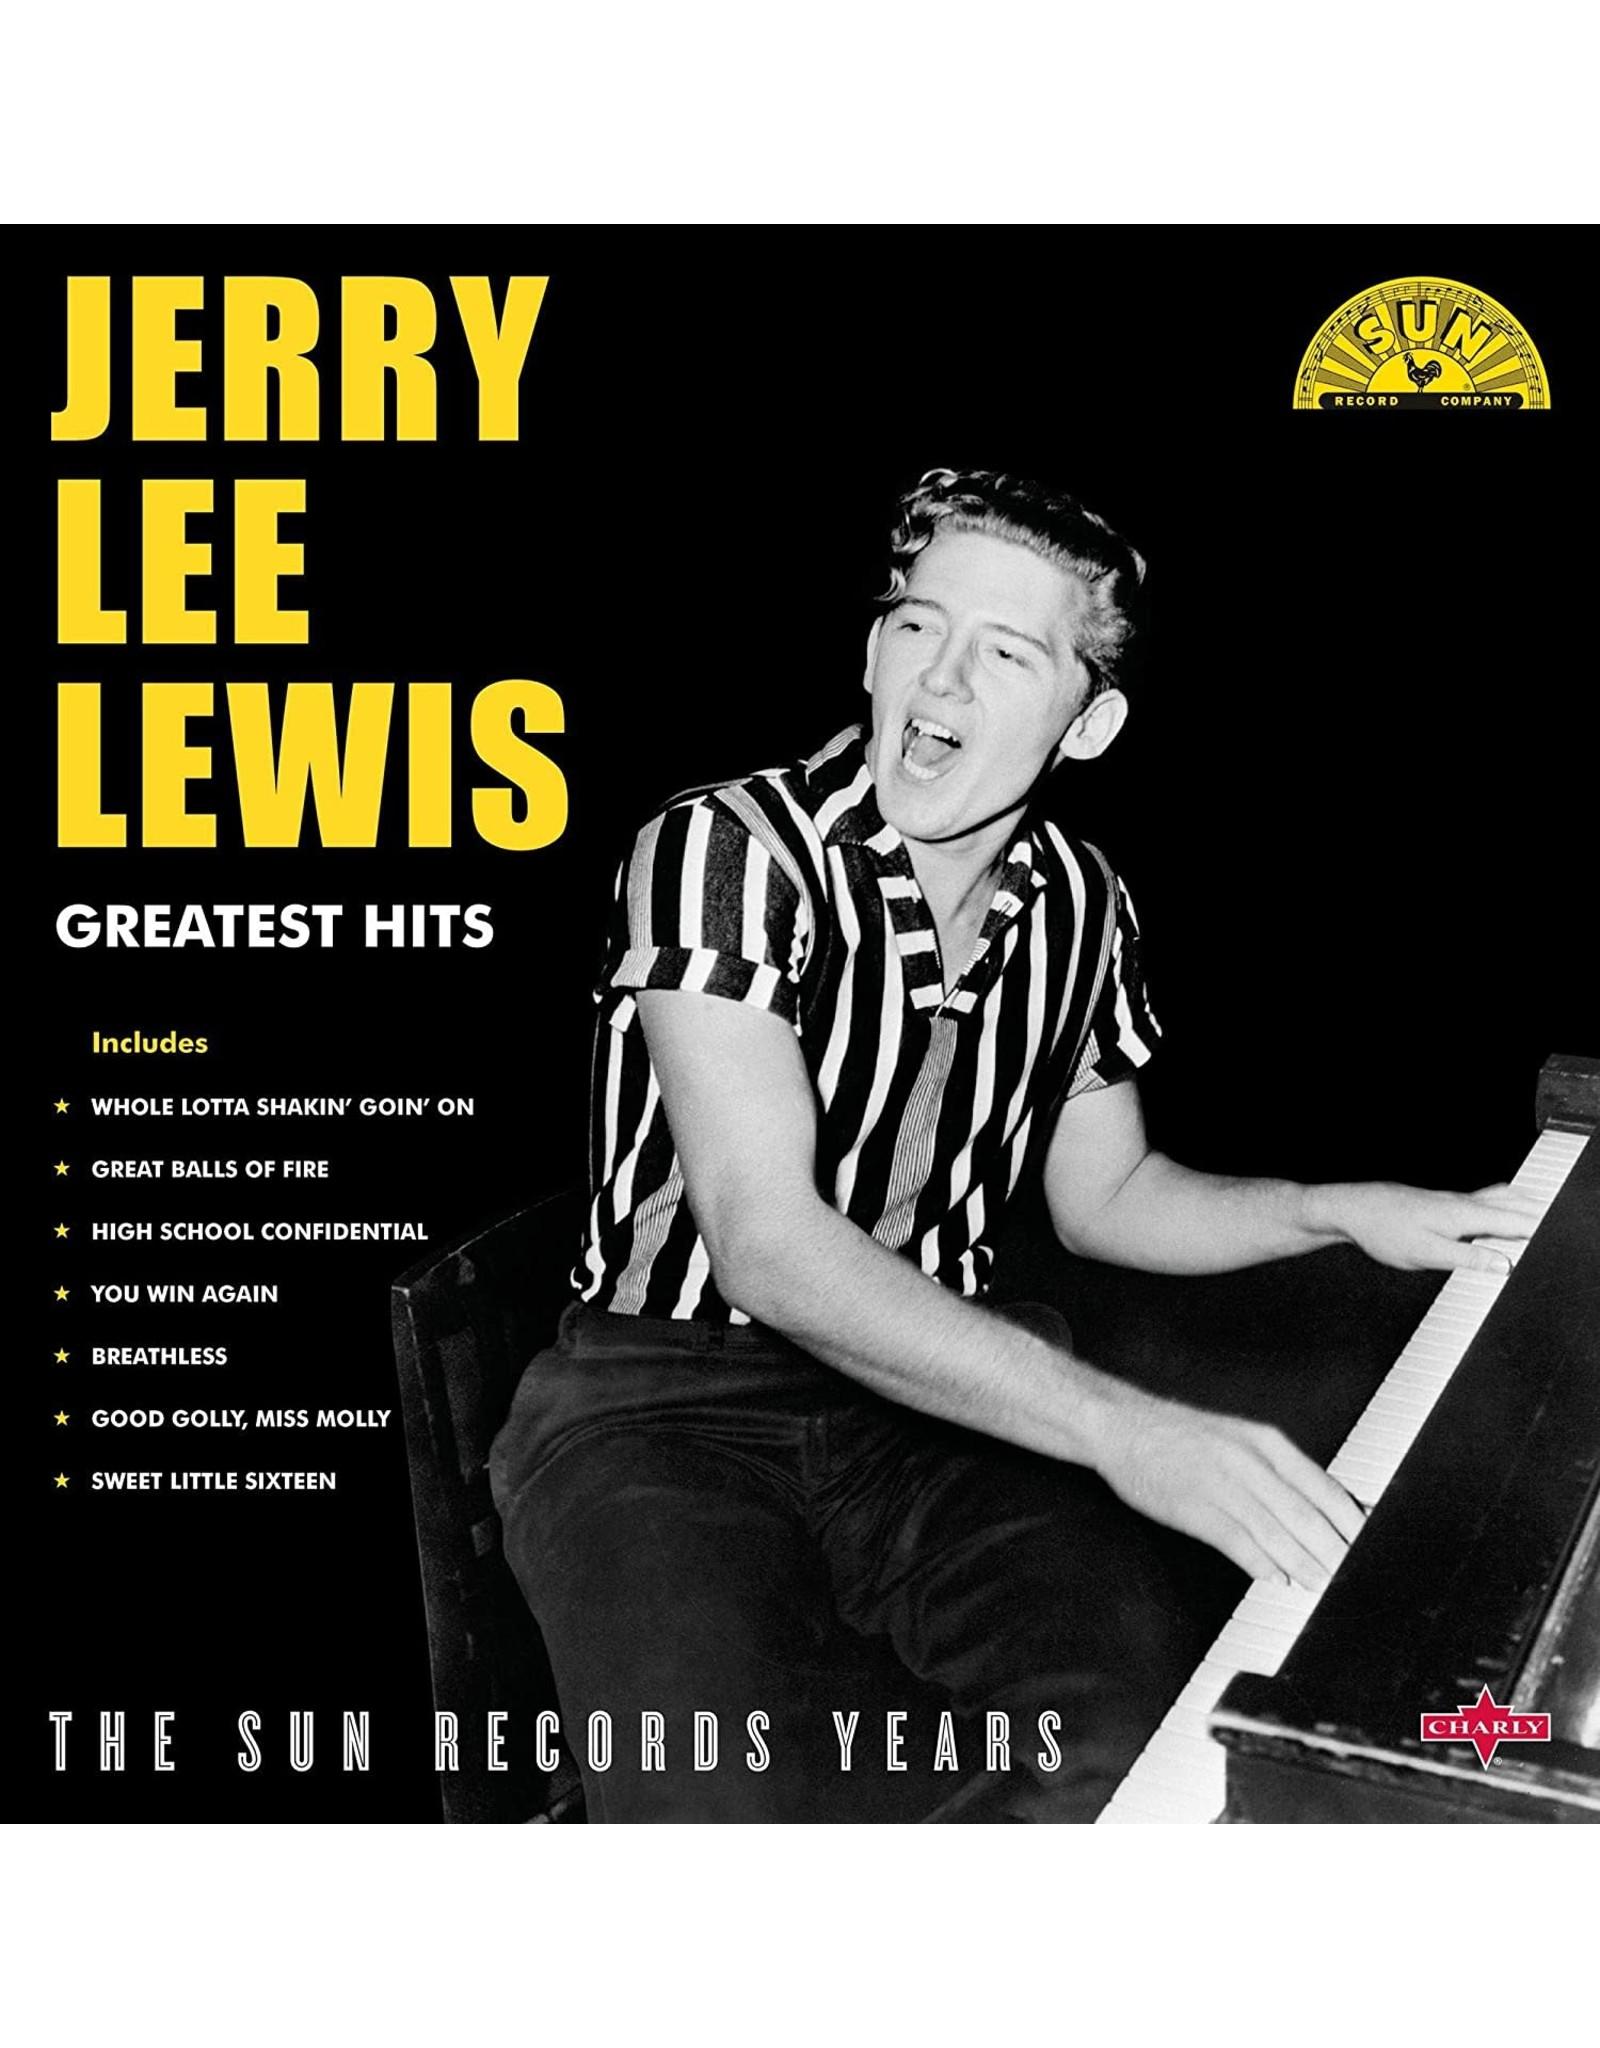 Jerry Lee Lewis - Greatest Hits (Half Speed Master) [Green Vinyl]